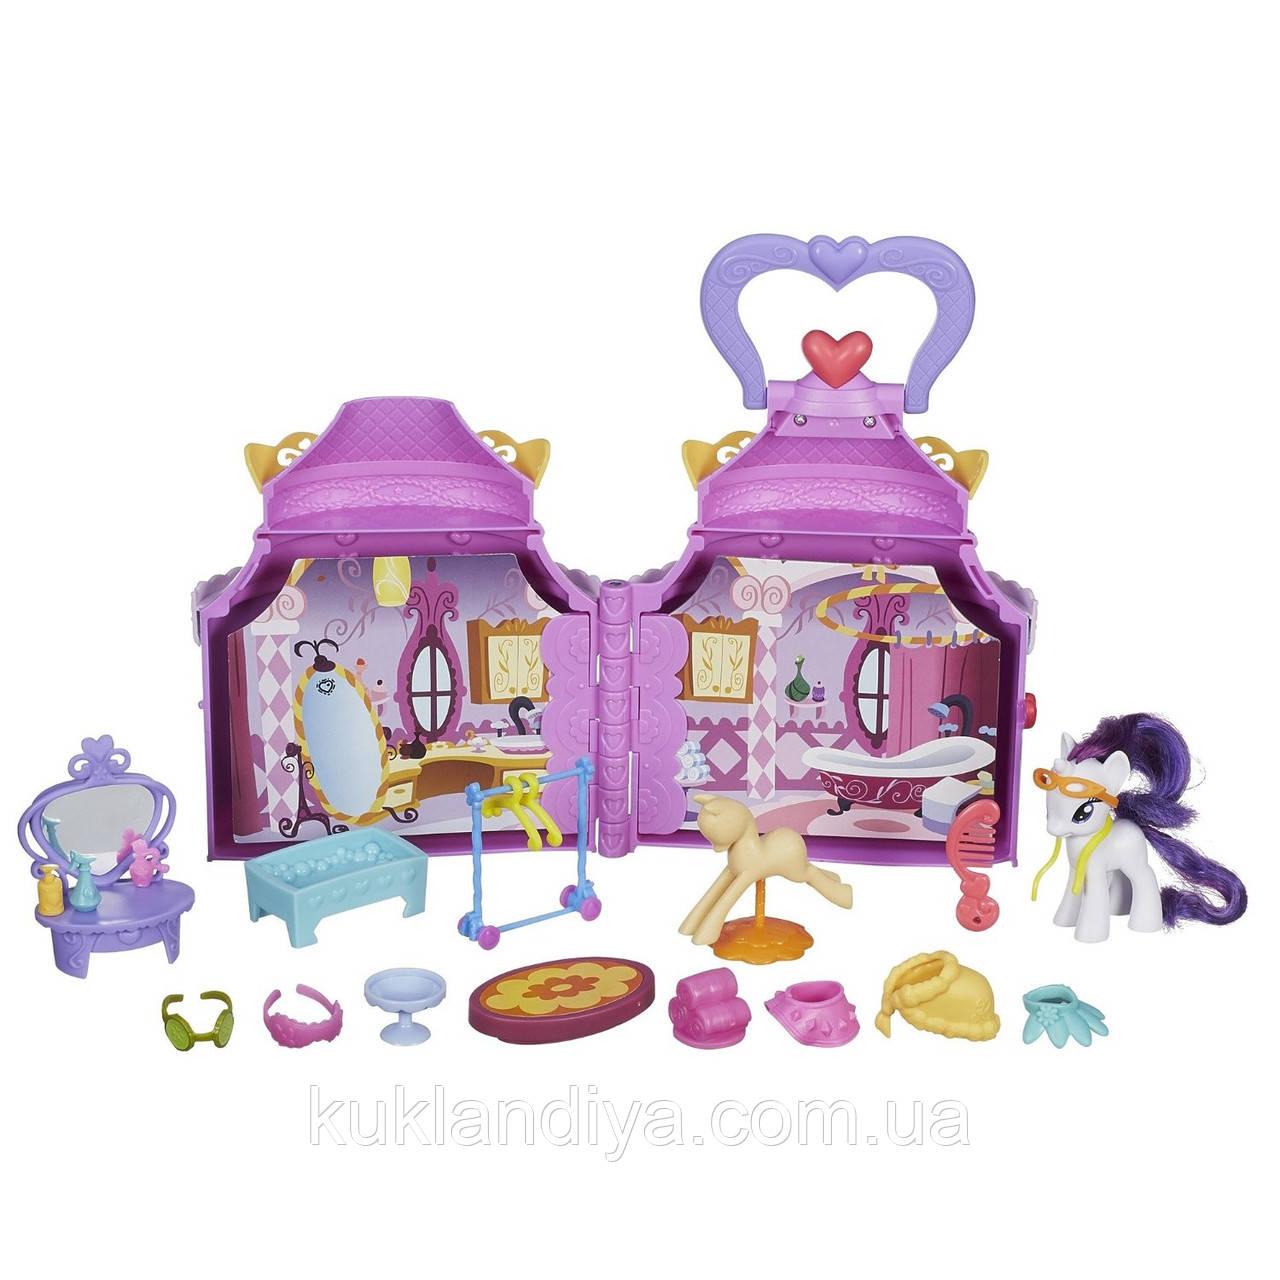 Игровой набор Бутик Рарити My Little Pony